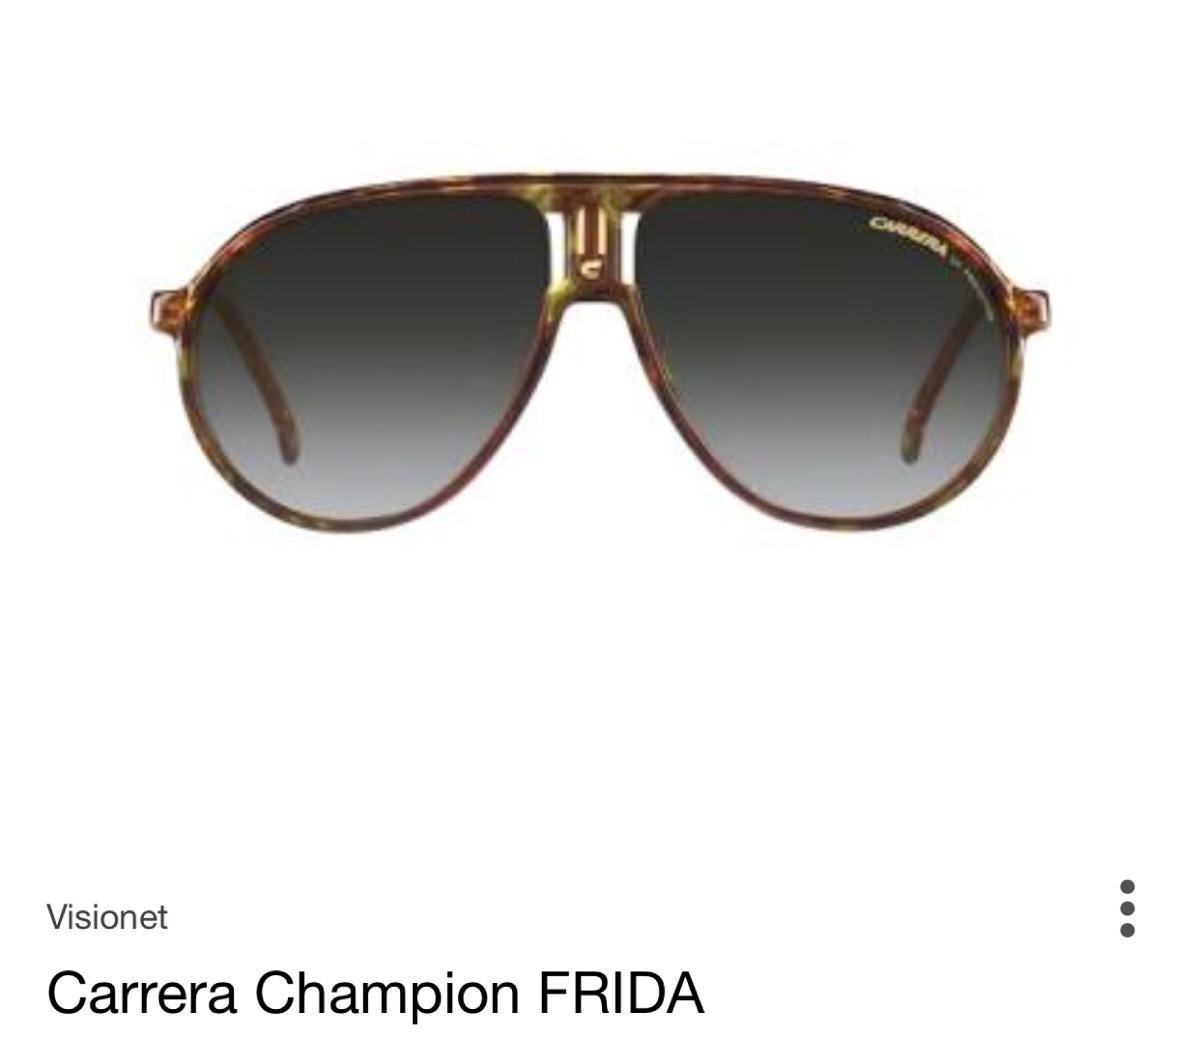 158908ddd61d2 óculos carrera champion frida. Carregando zoom.